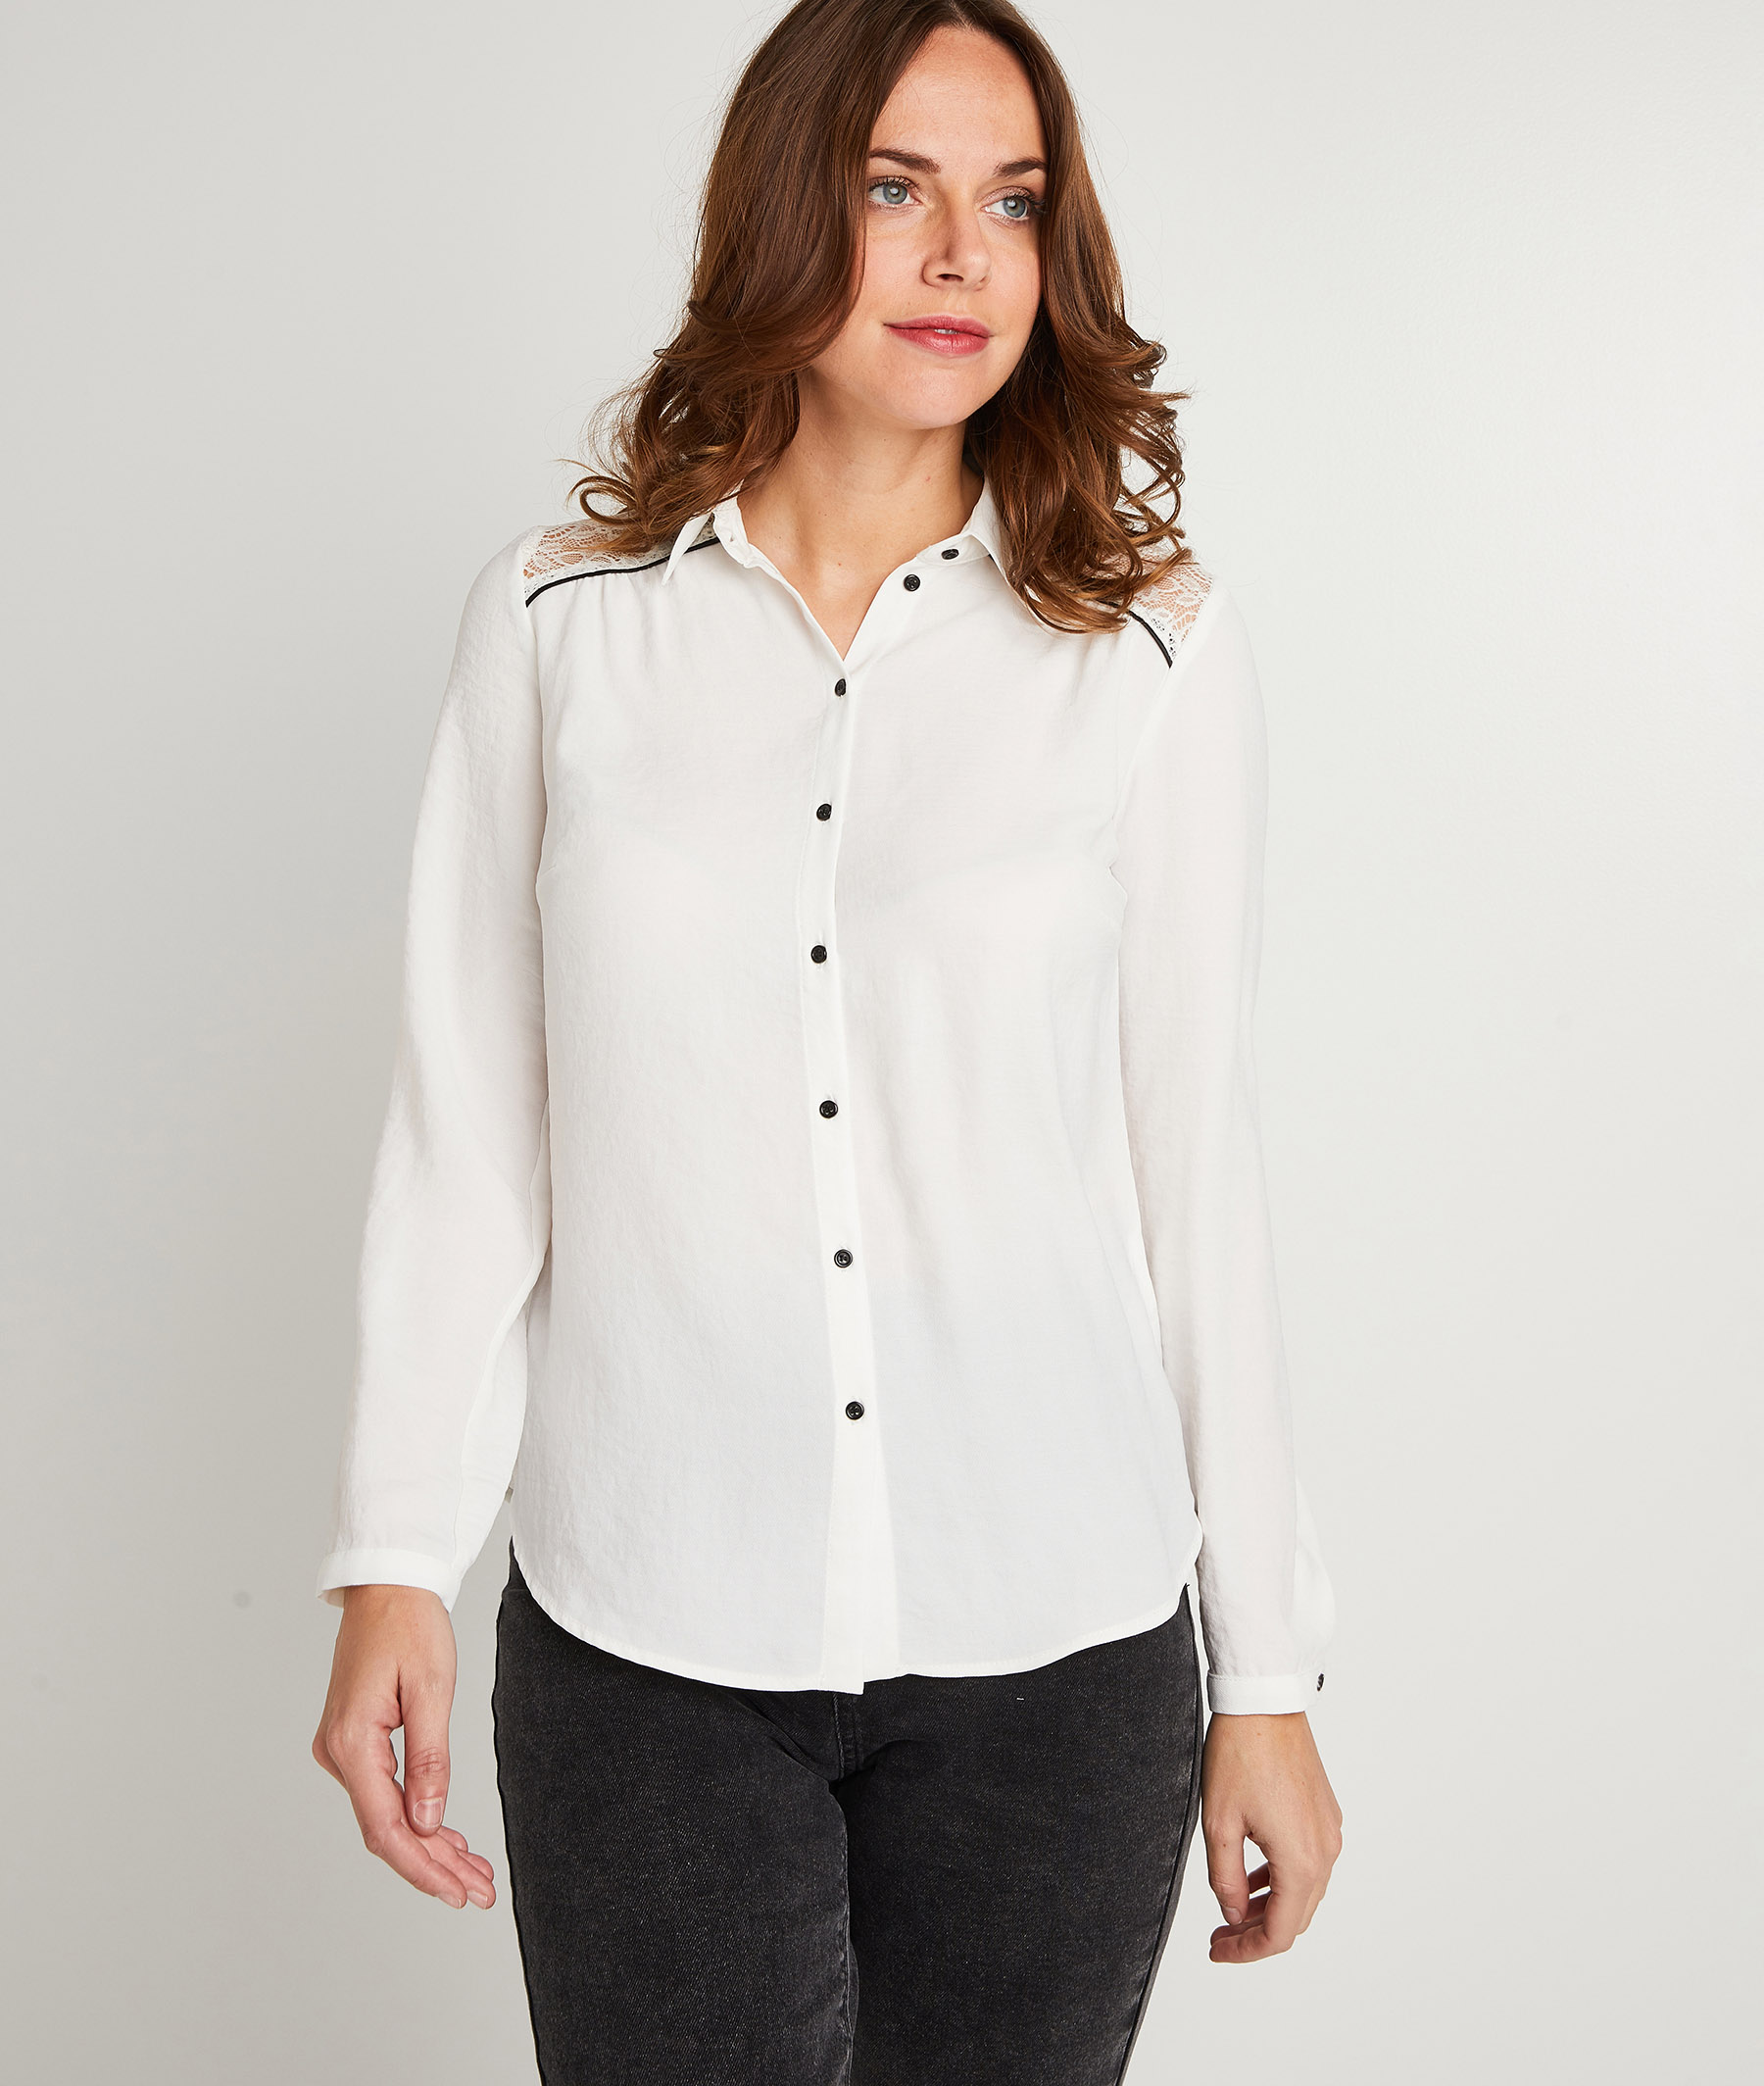 Chemise blanche femme ECRU